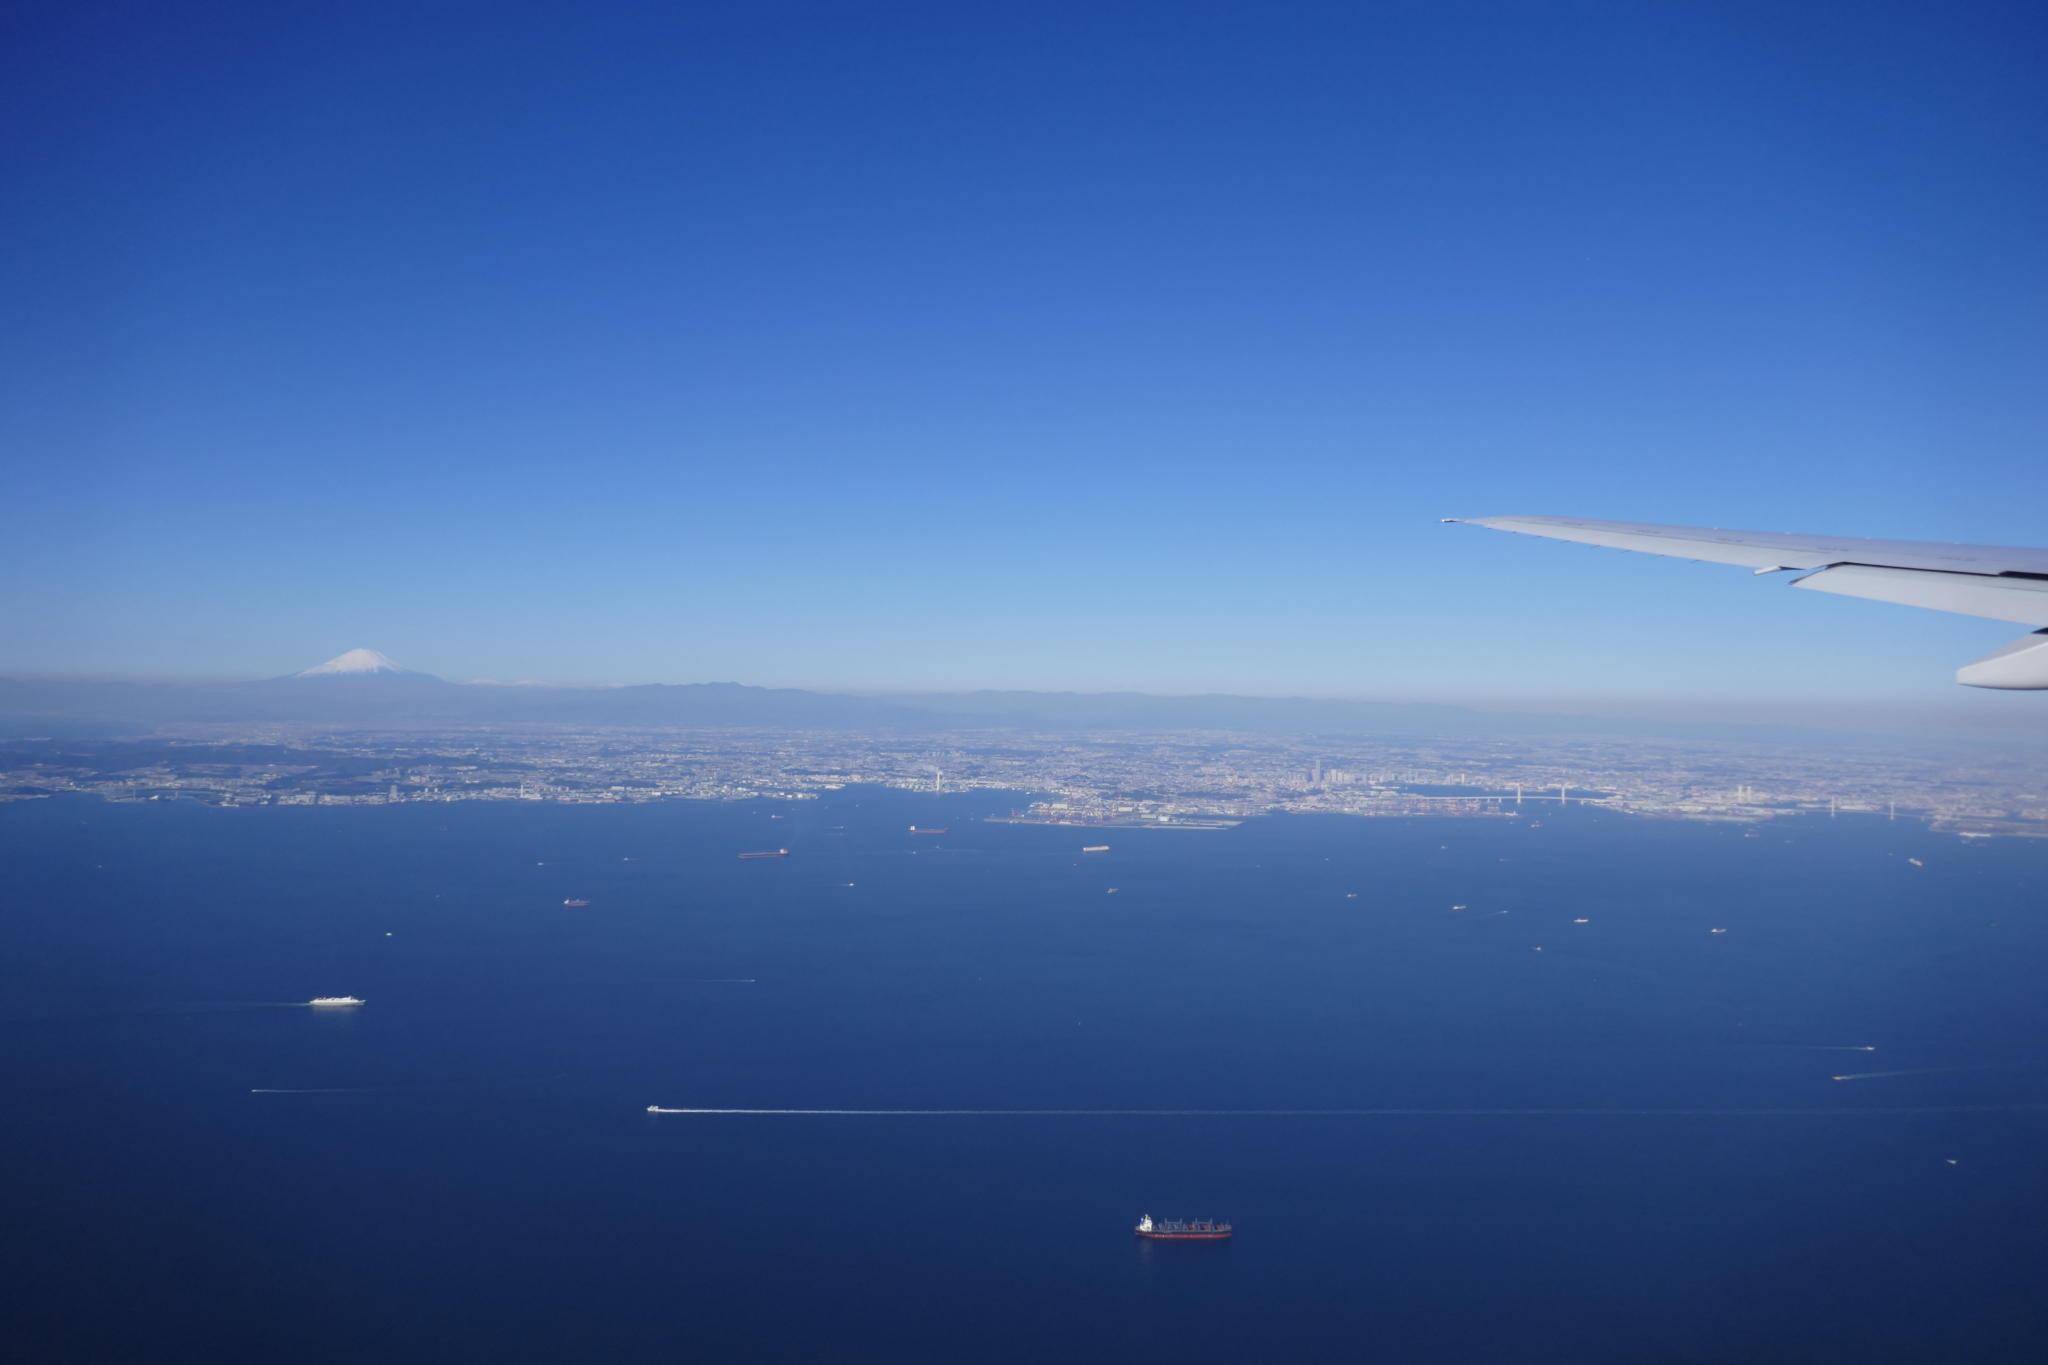 Aerial view of Mount Fuji, Tokyo